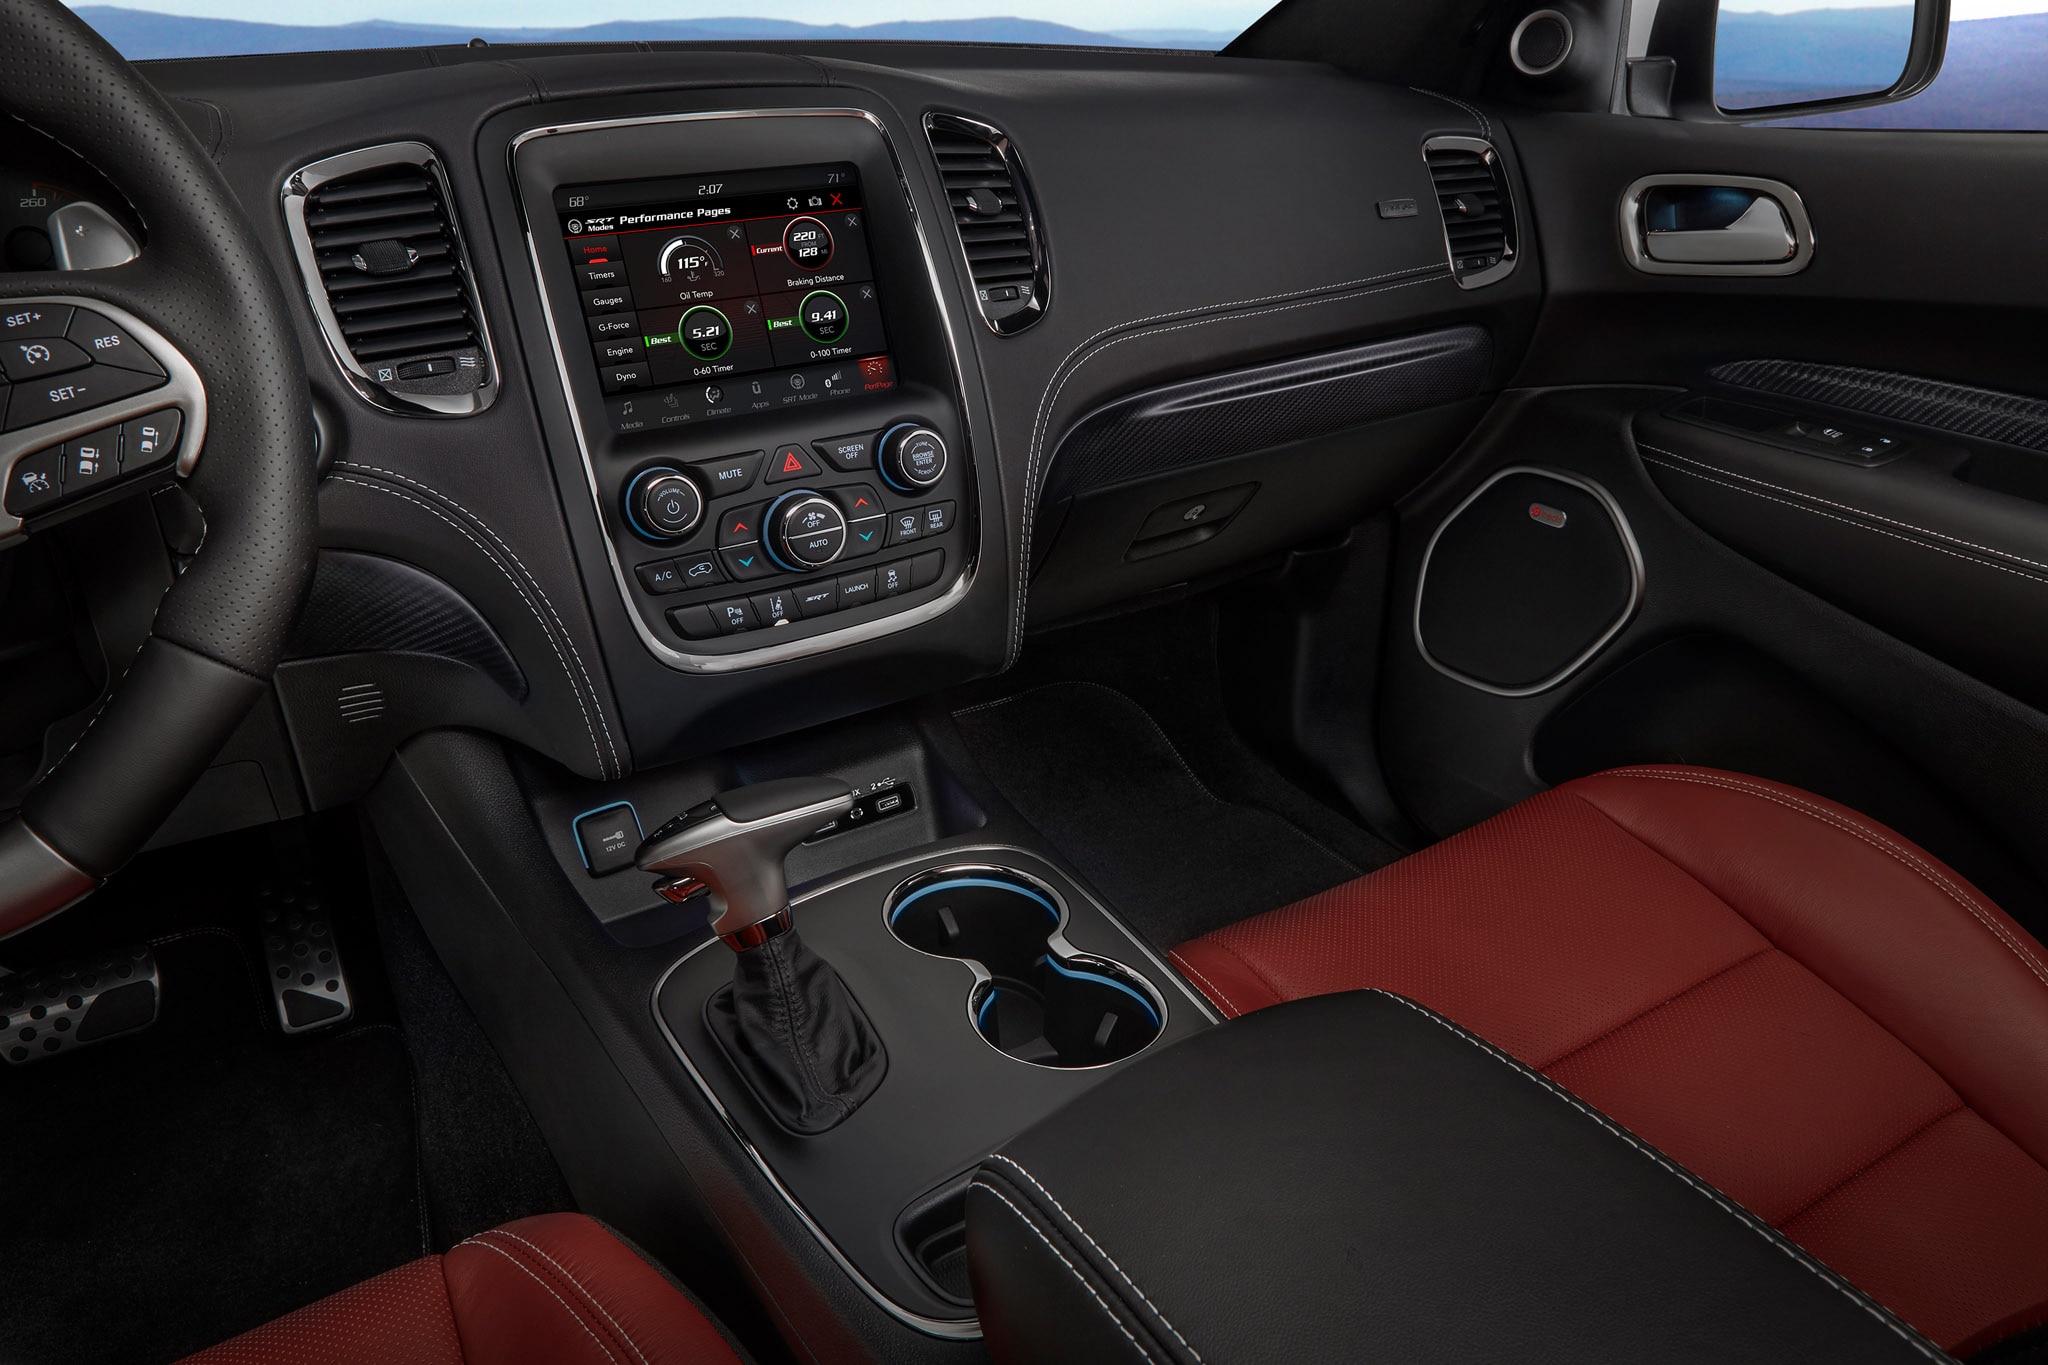 2018 dodge durango r t and srt gets stripes and more mopar - Dodge durango 2017 interior pictures ...